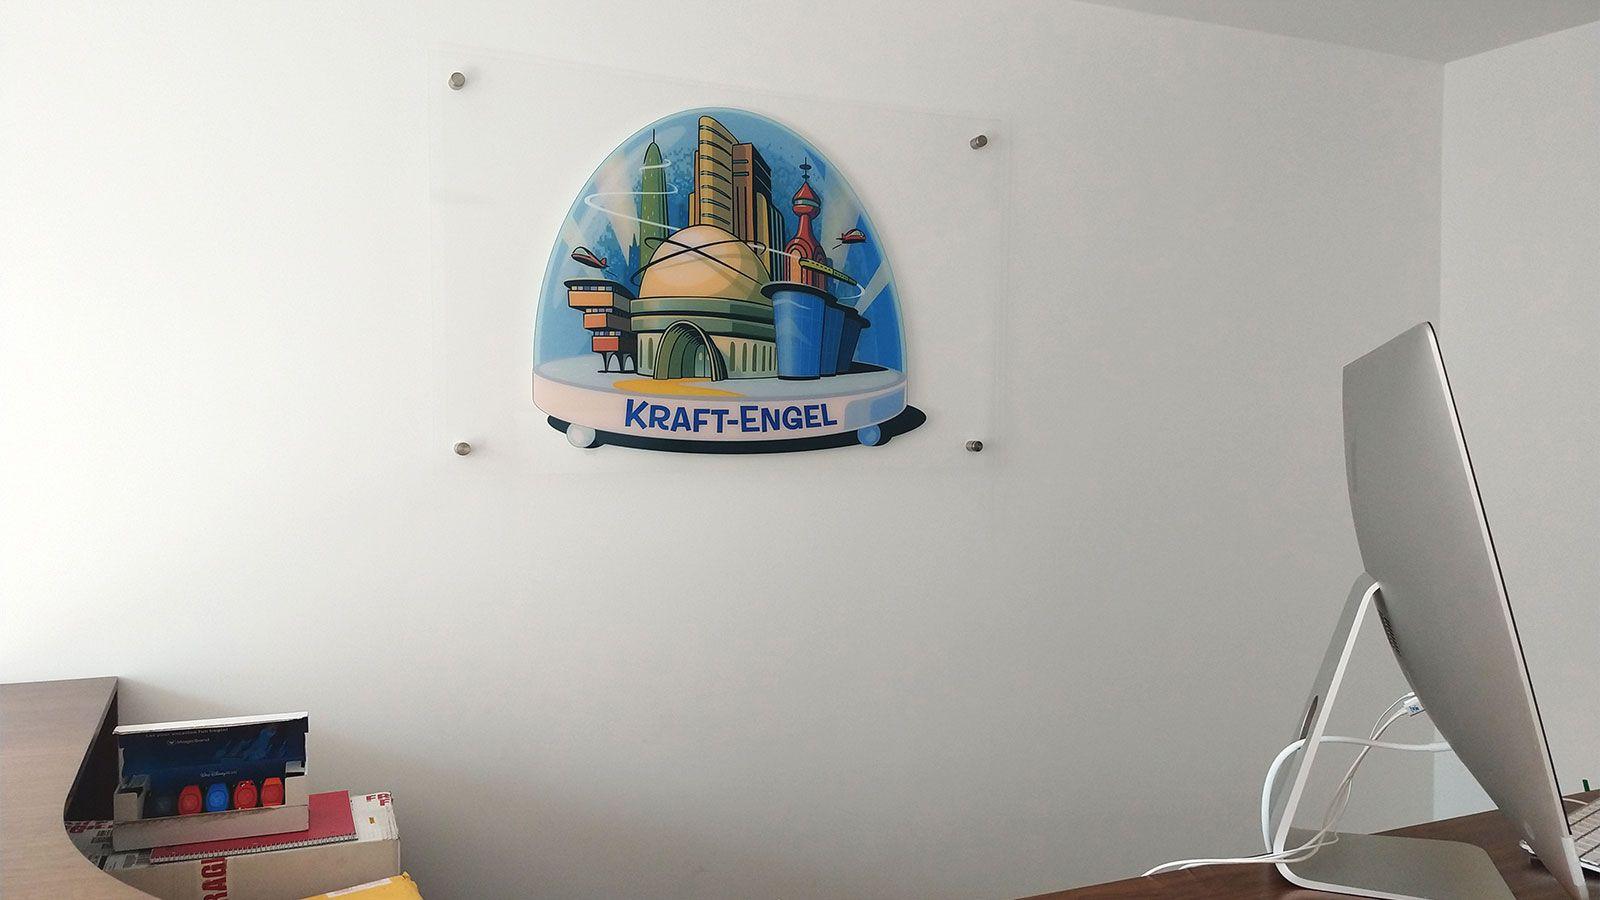 Kraft-Engel acrylic sign